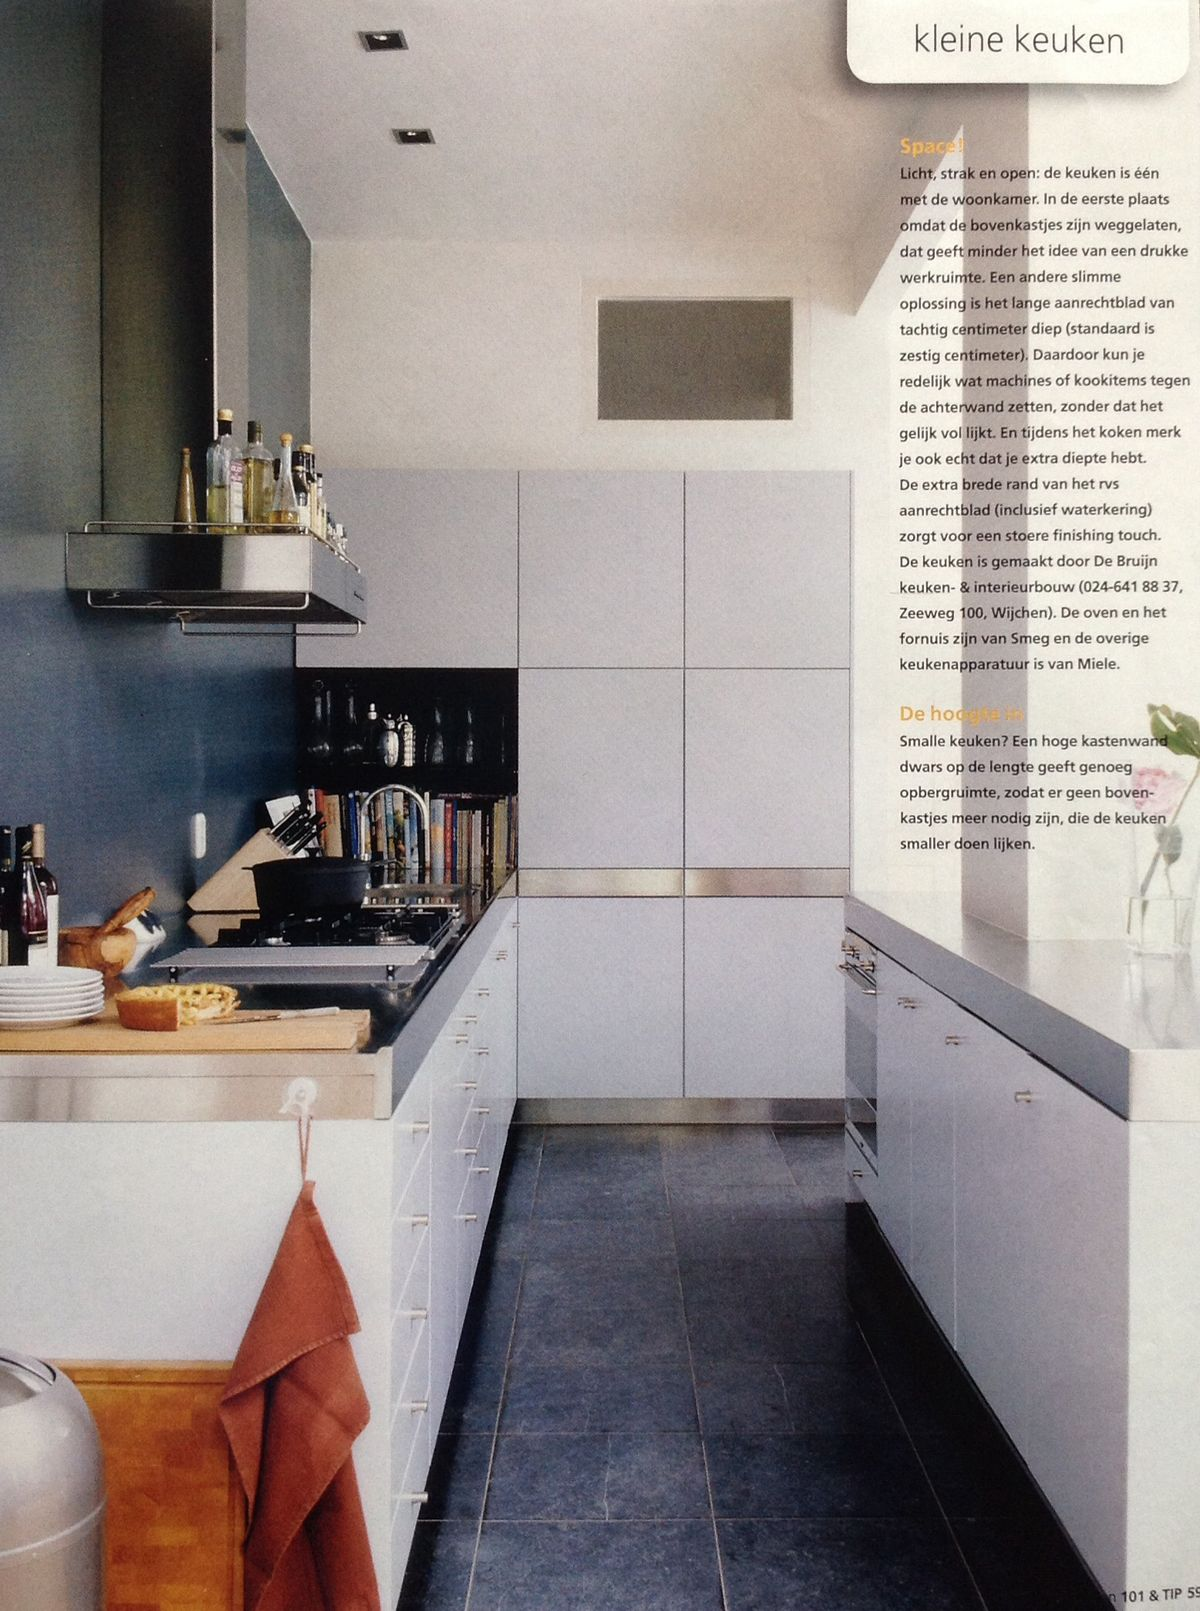 Meer dan 1000 idee n over kleine keuken tafels op pinterest keukentafels ronde keukentafels - Klein keuken model ...